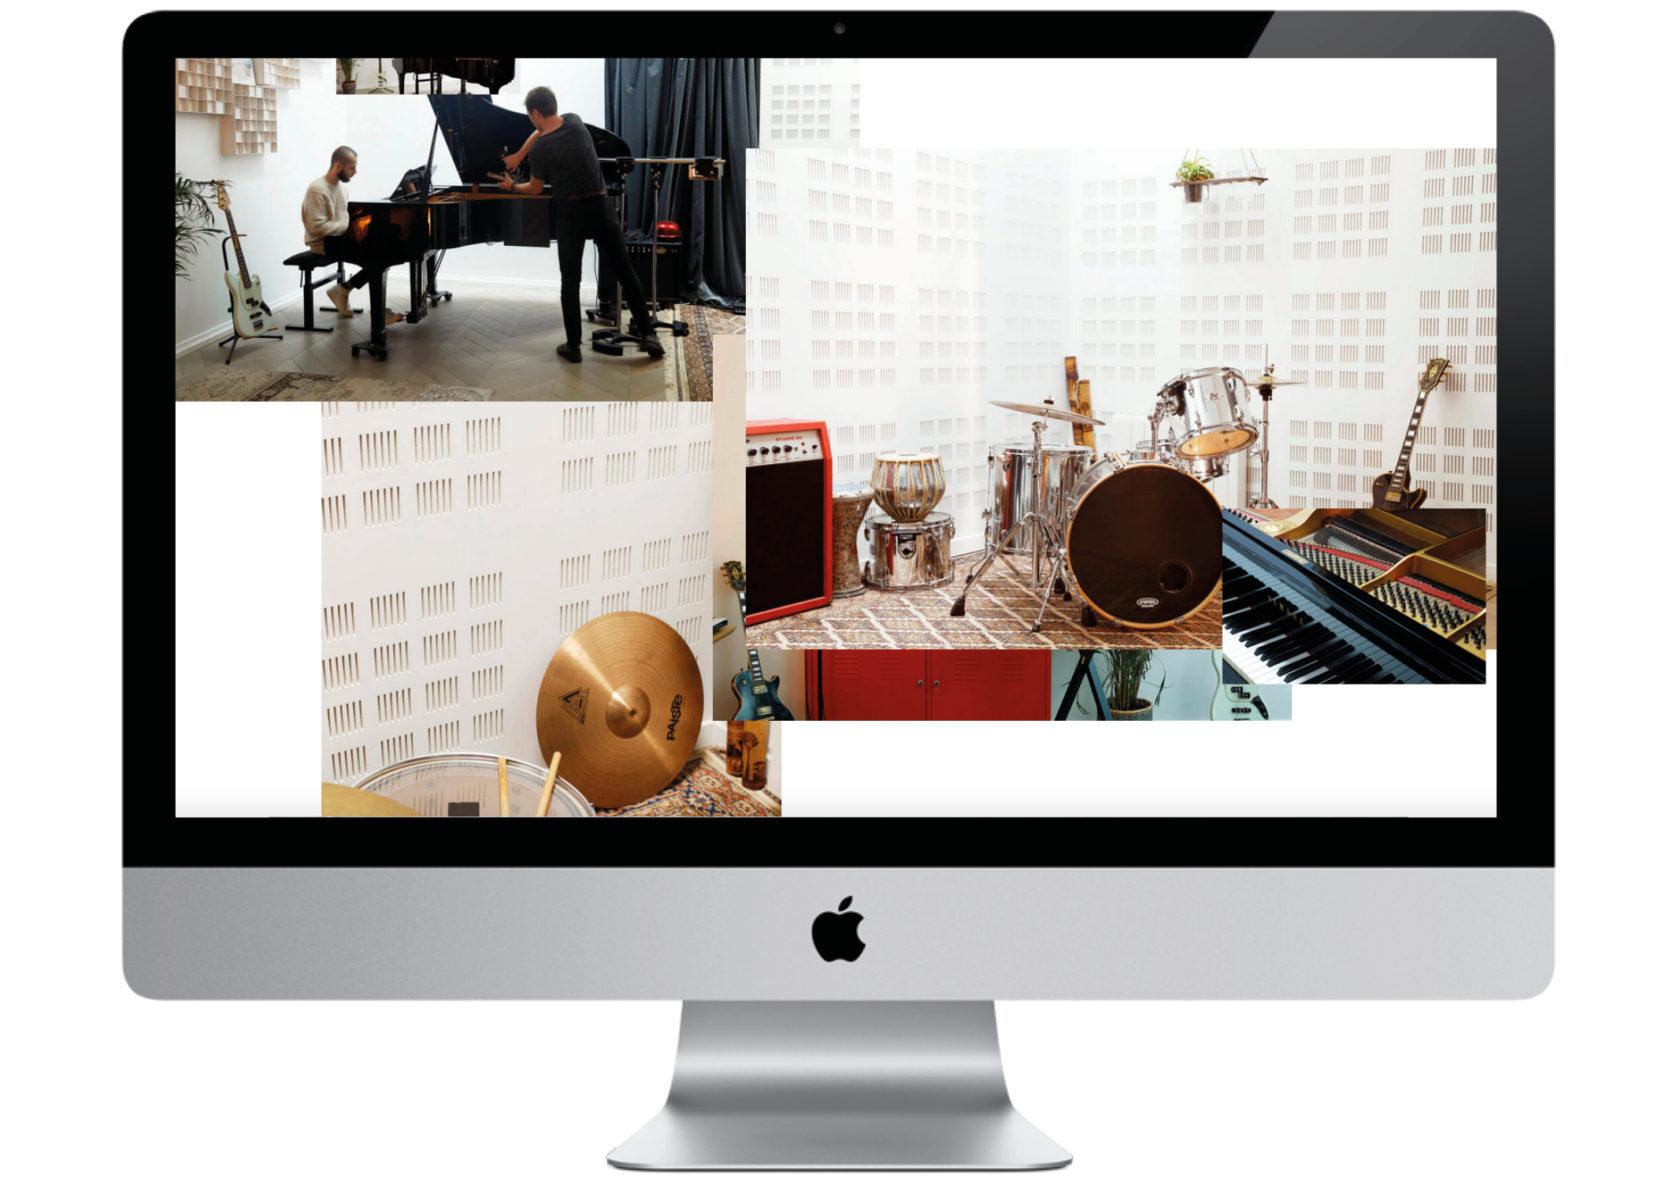 fouinzanardi - fz_web_imac_studio48L